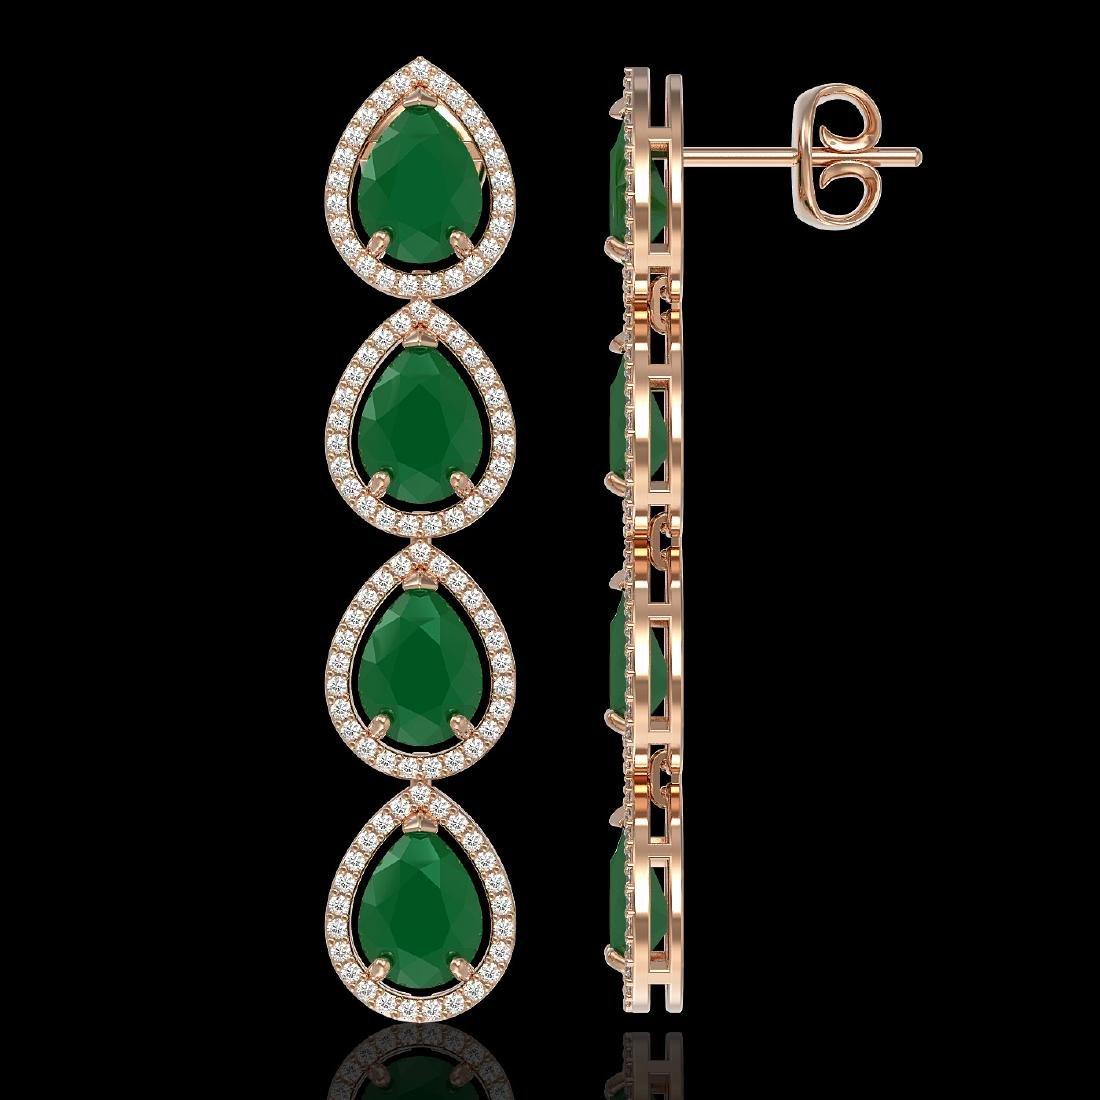 16.01 CTW Emerald & Diamond Halo Earrings 10K Rose Gold - 2